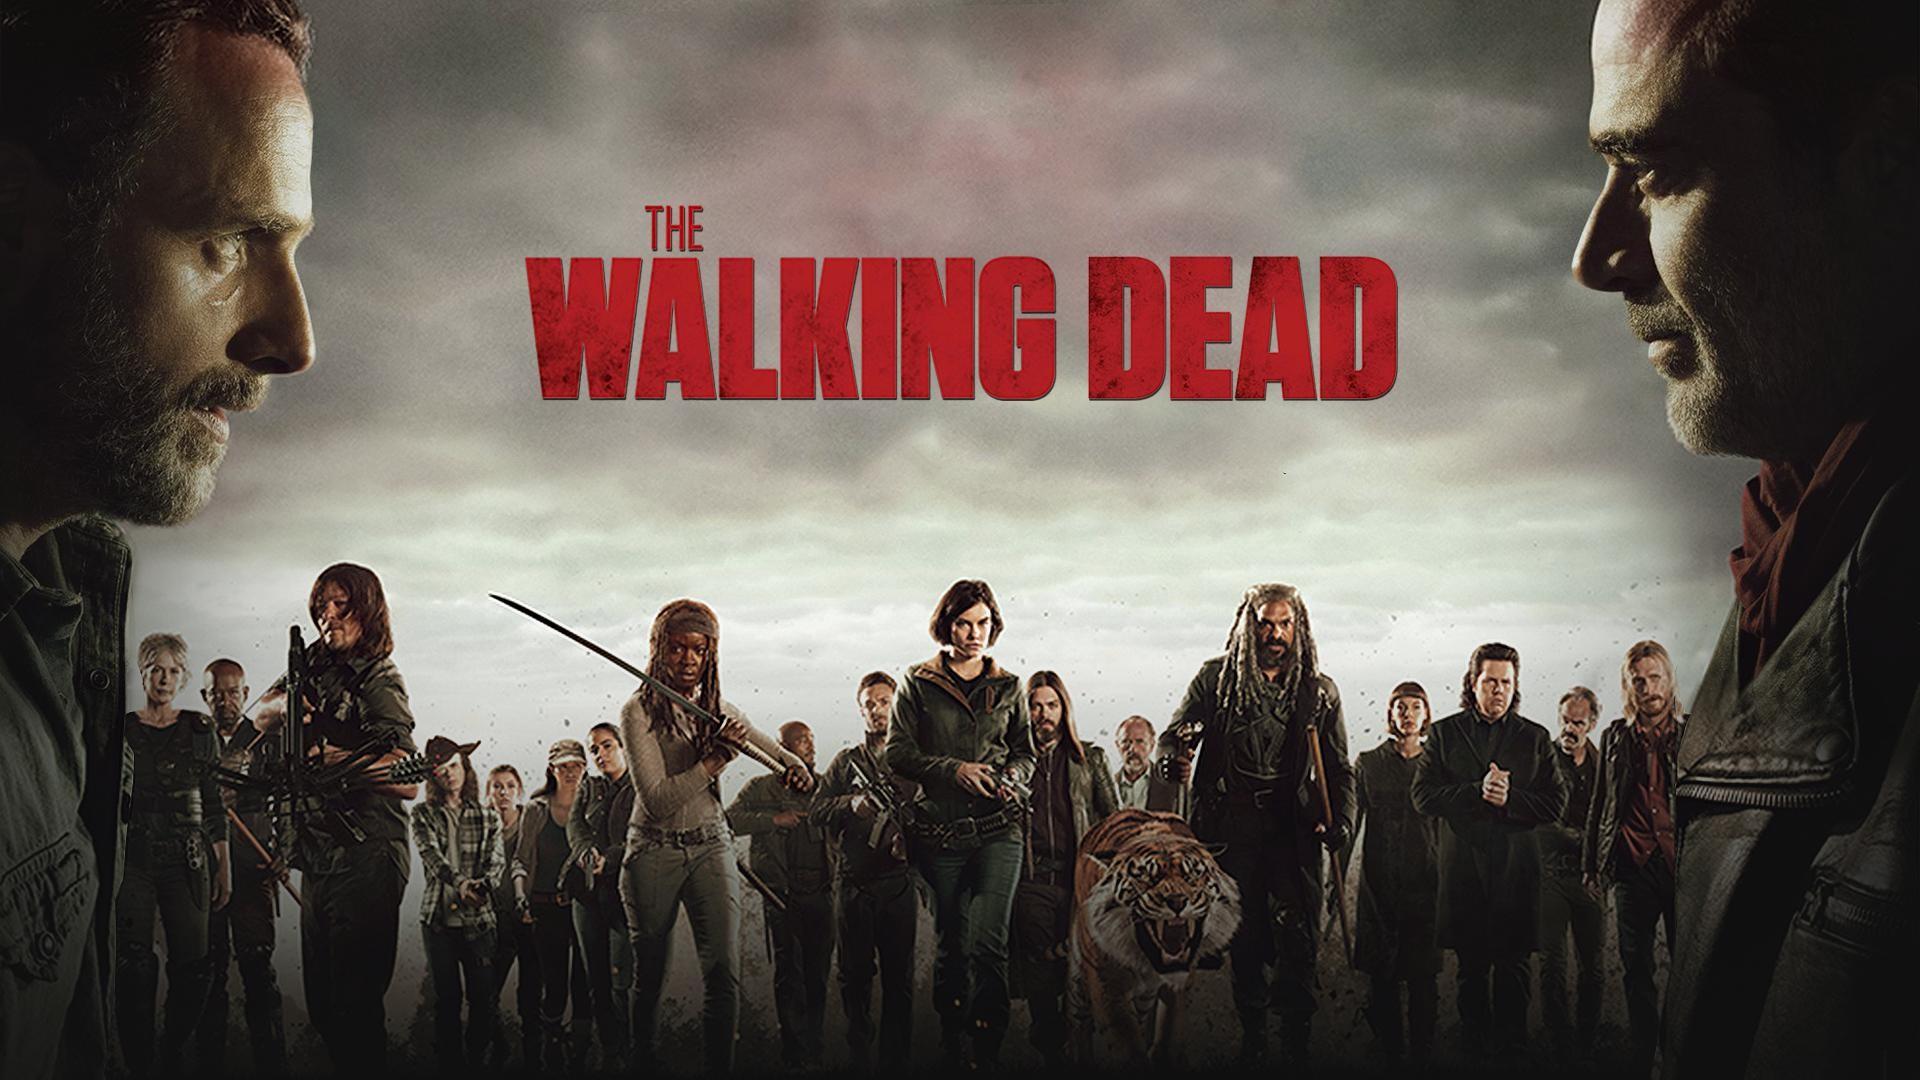 Walking Dead Wallpapers Wallpapertag